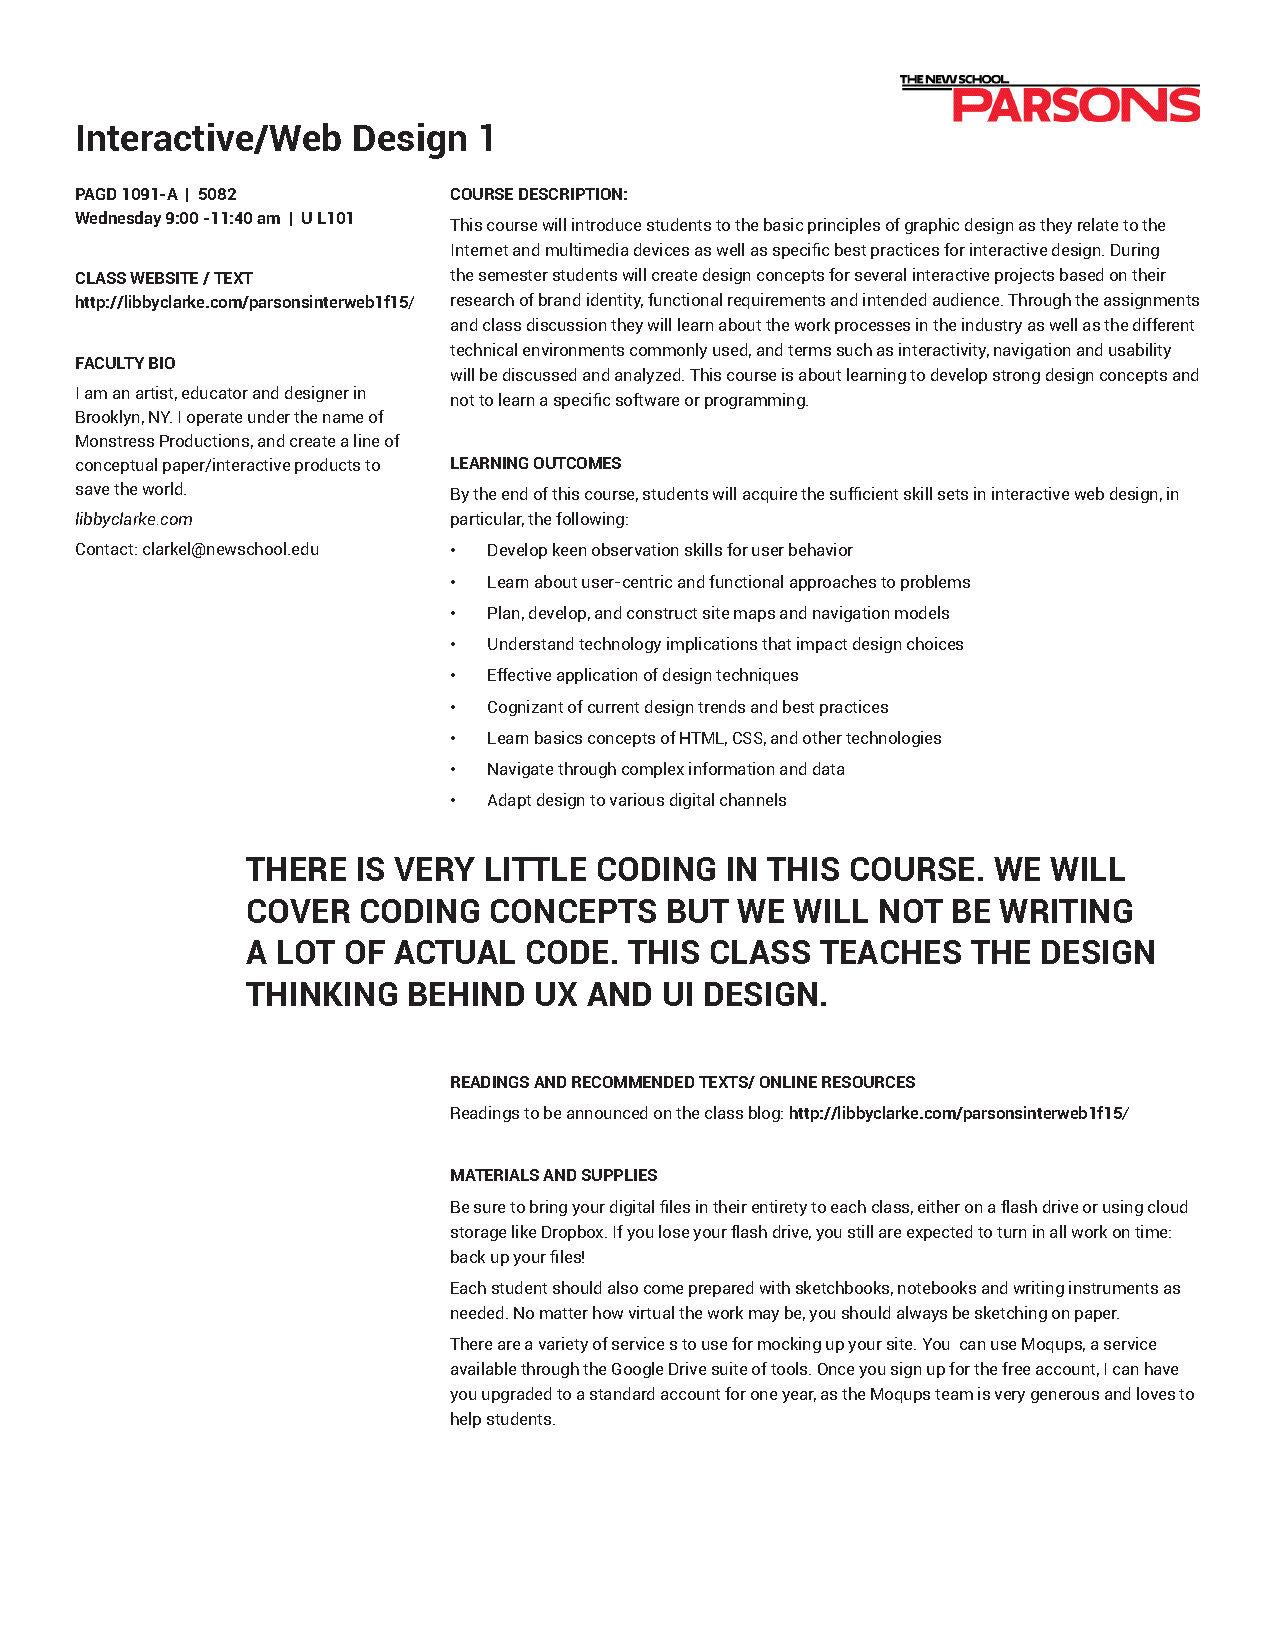 seclarke_materials_risd_Page_08.jpg